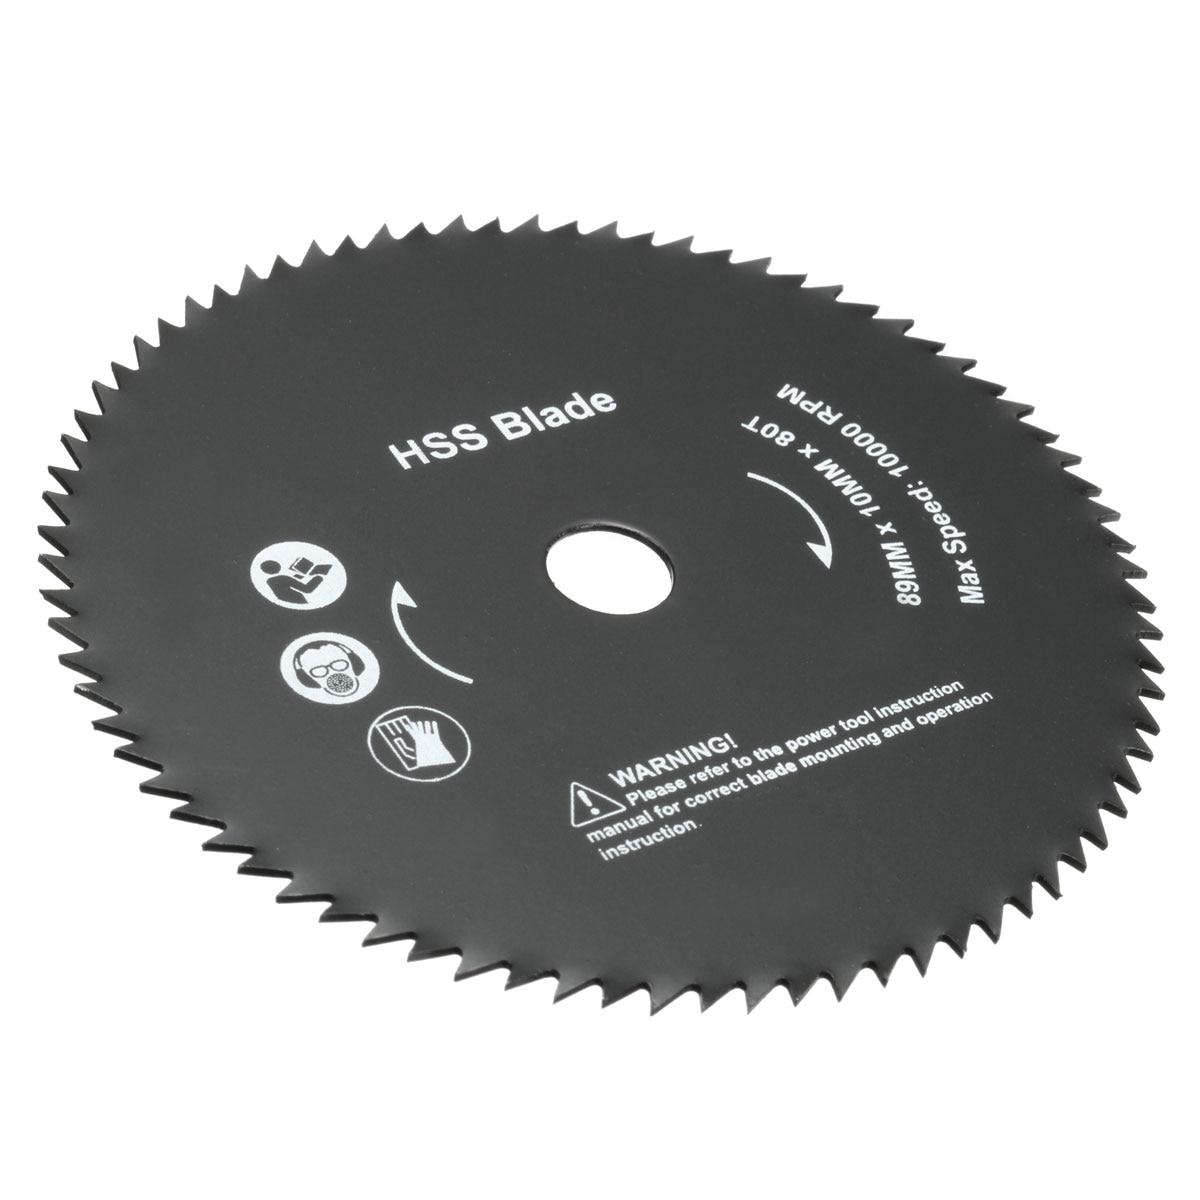 Top Quality 1PC 3.5''x0.39'' 80 Teeth Circular Saw HSS Rotary Blade Cutting Discs Wheel Tool New Arrival 6cm x 0 05cm x 1 6cm 72 teeth hss slitting saw blade cutting tool